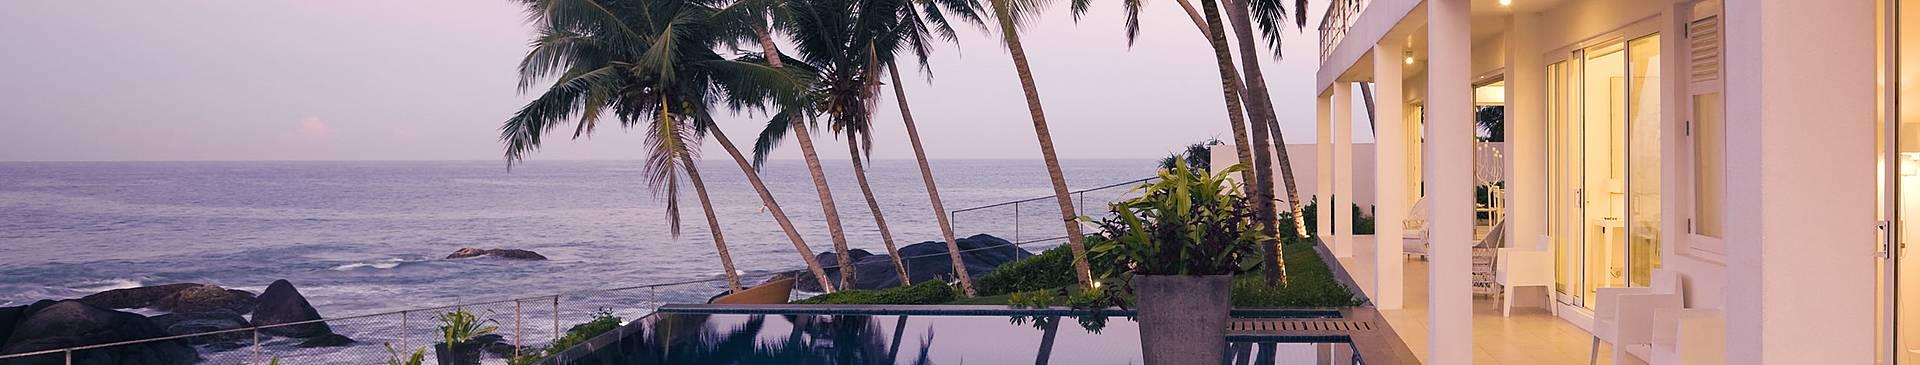 Circuits Charme et luxe au Sri Lanka